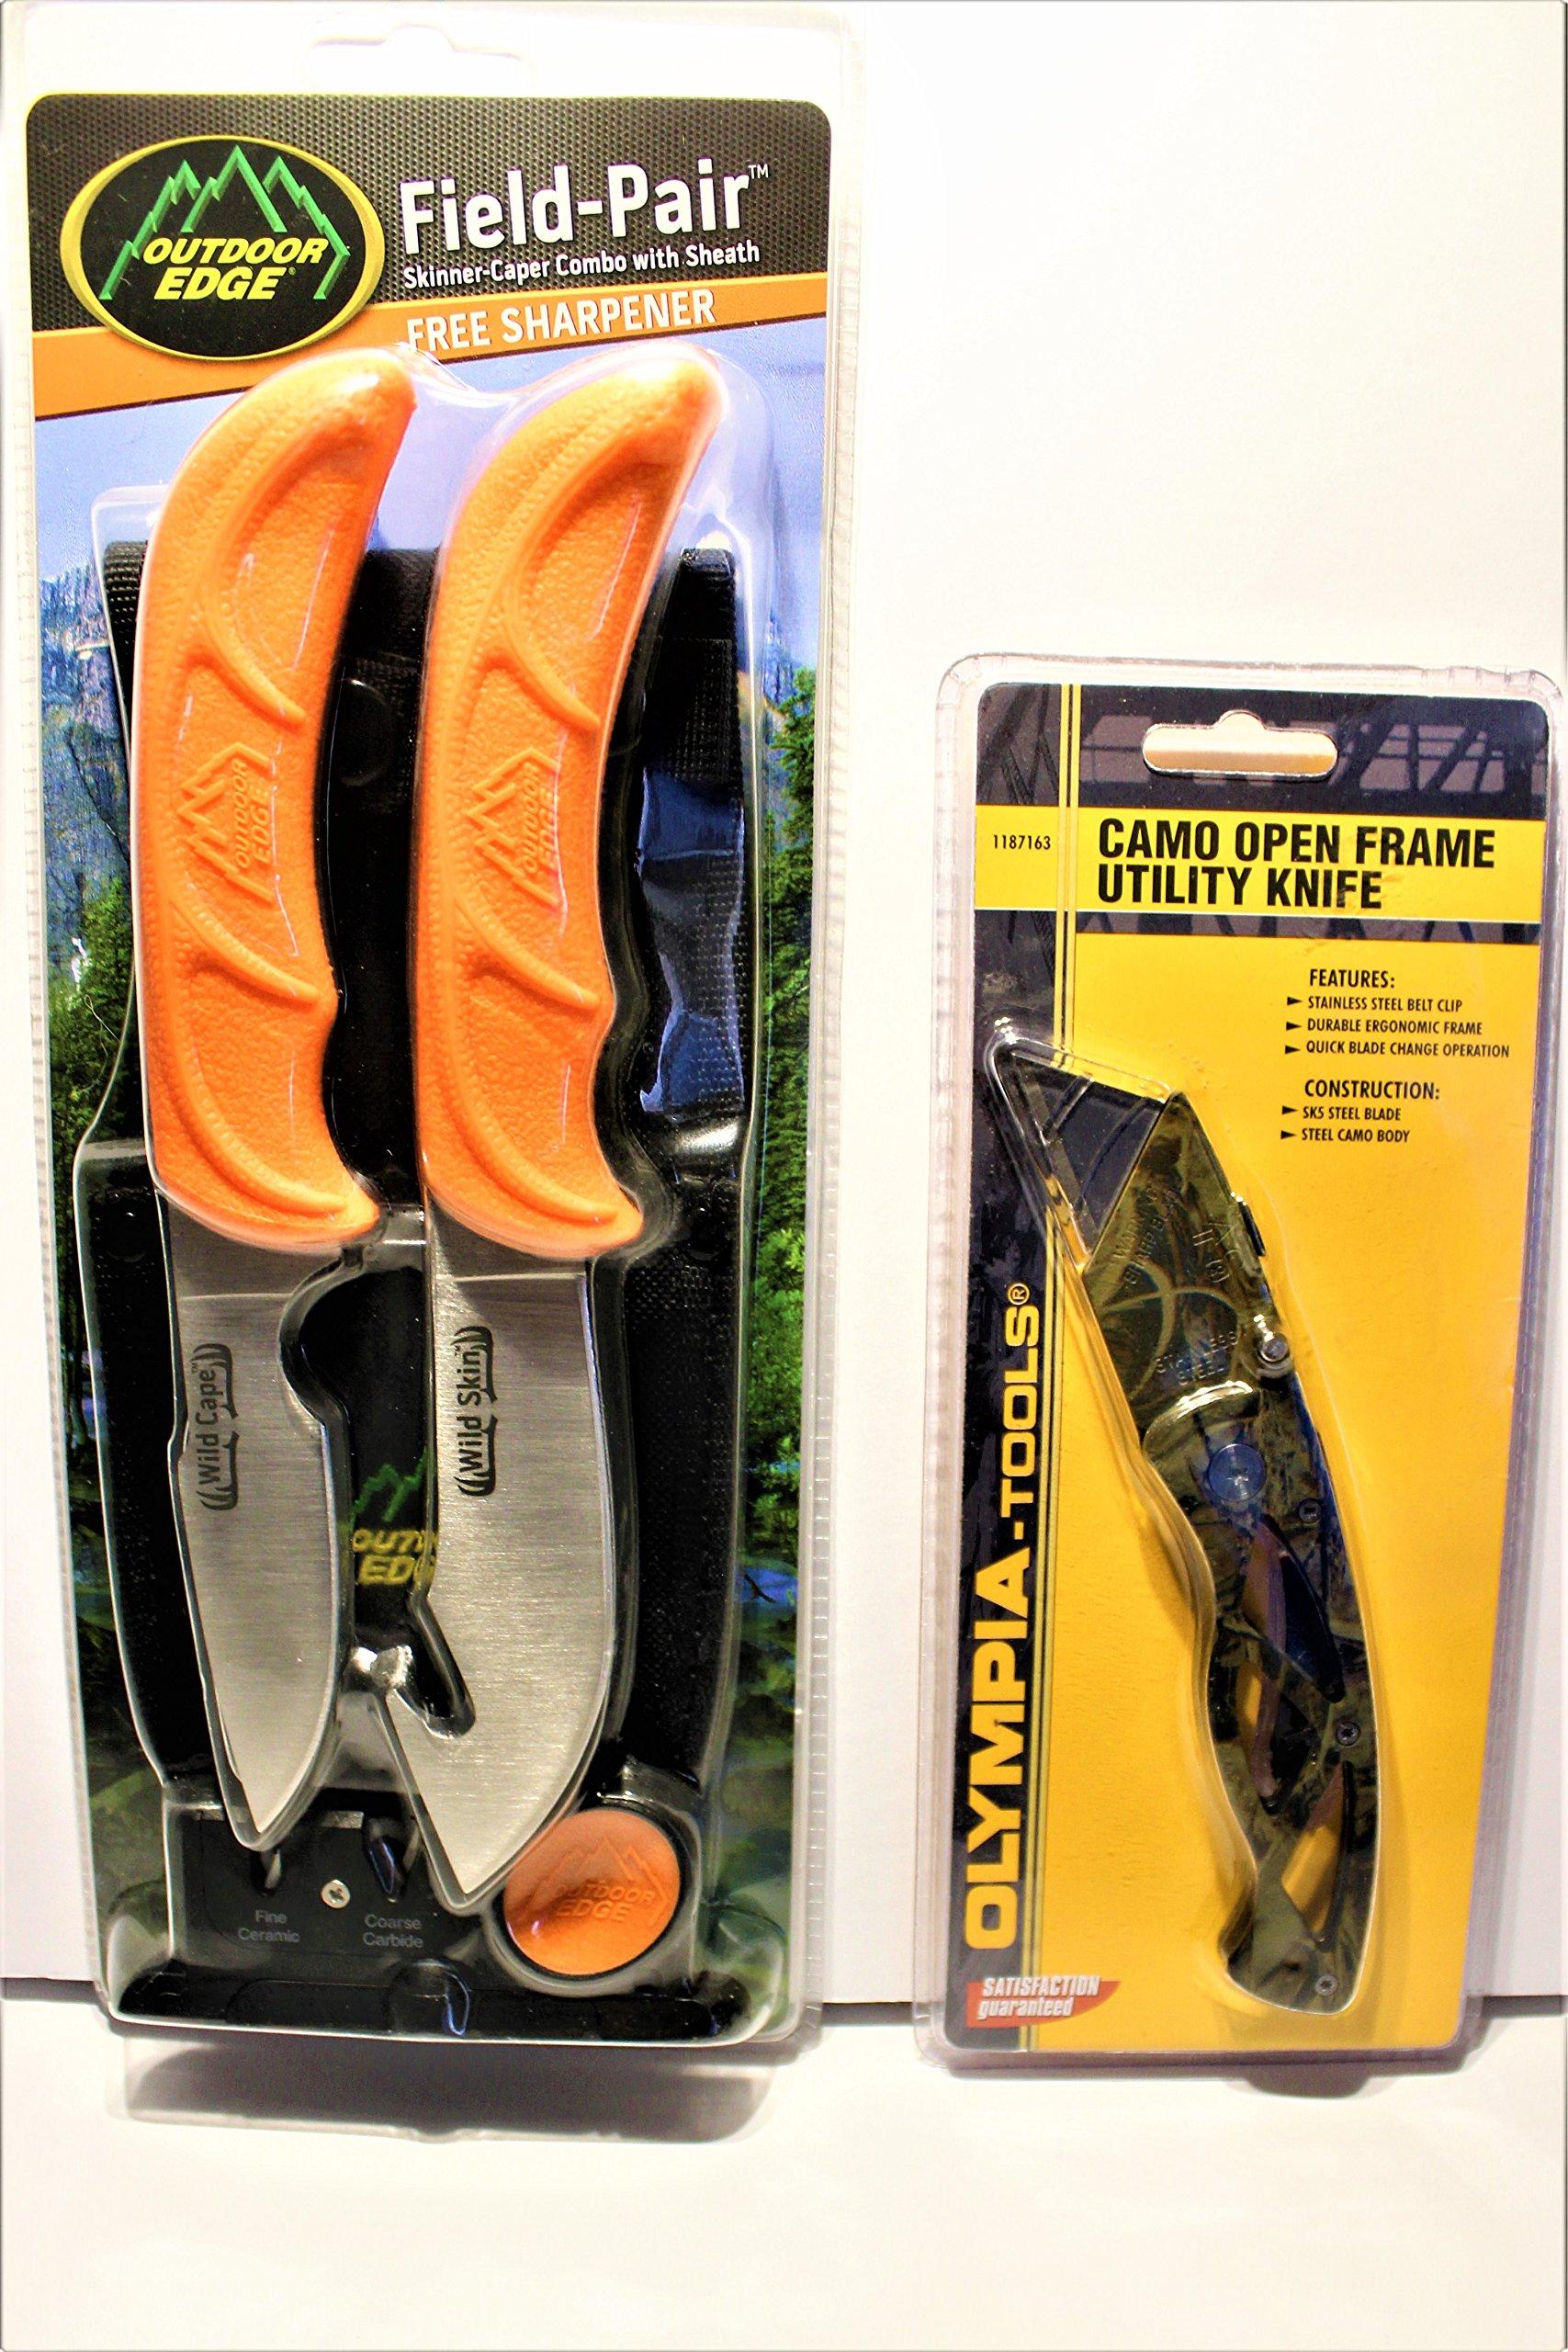 Field-Pair Skinner-Caper Combo with sheath, sharpener, and Bonus Utility Knife